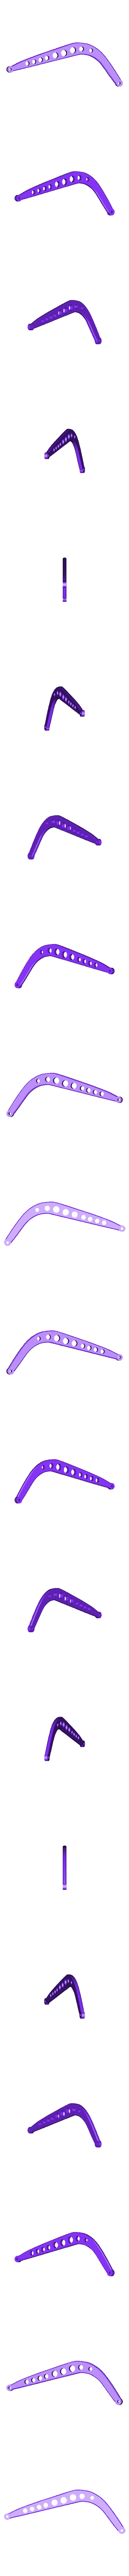 spine.stl Download free STL file Airbus Inspired Aviation Lamp - Remix • 3D printing design, FreeBug